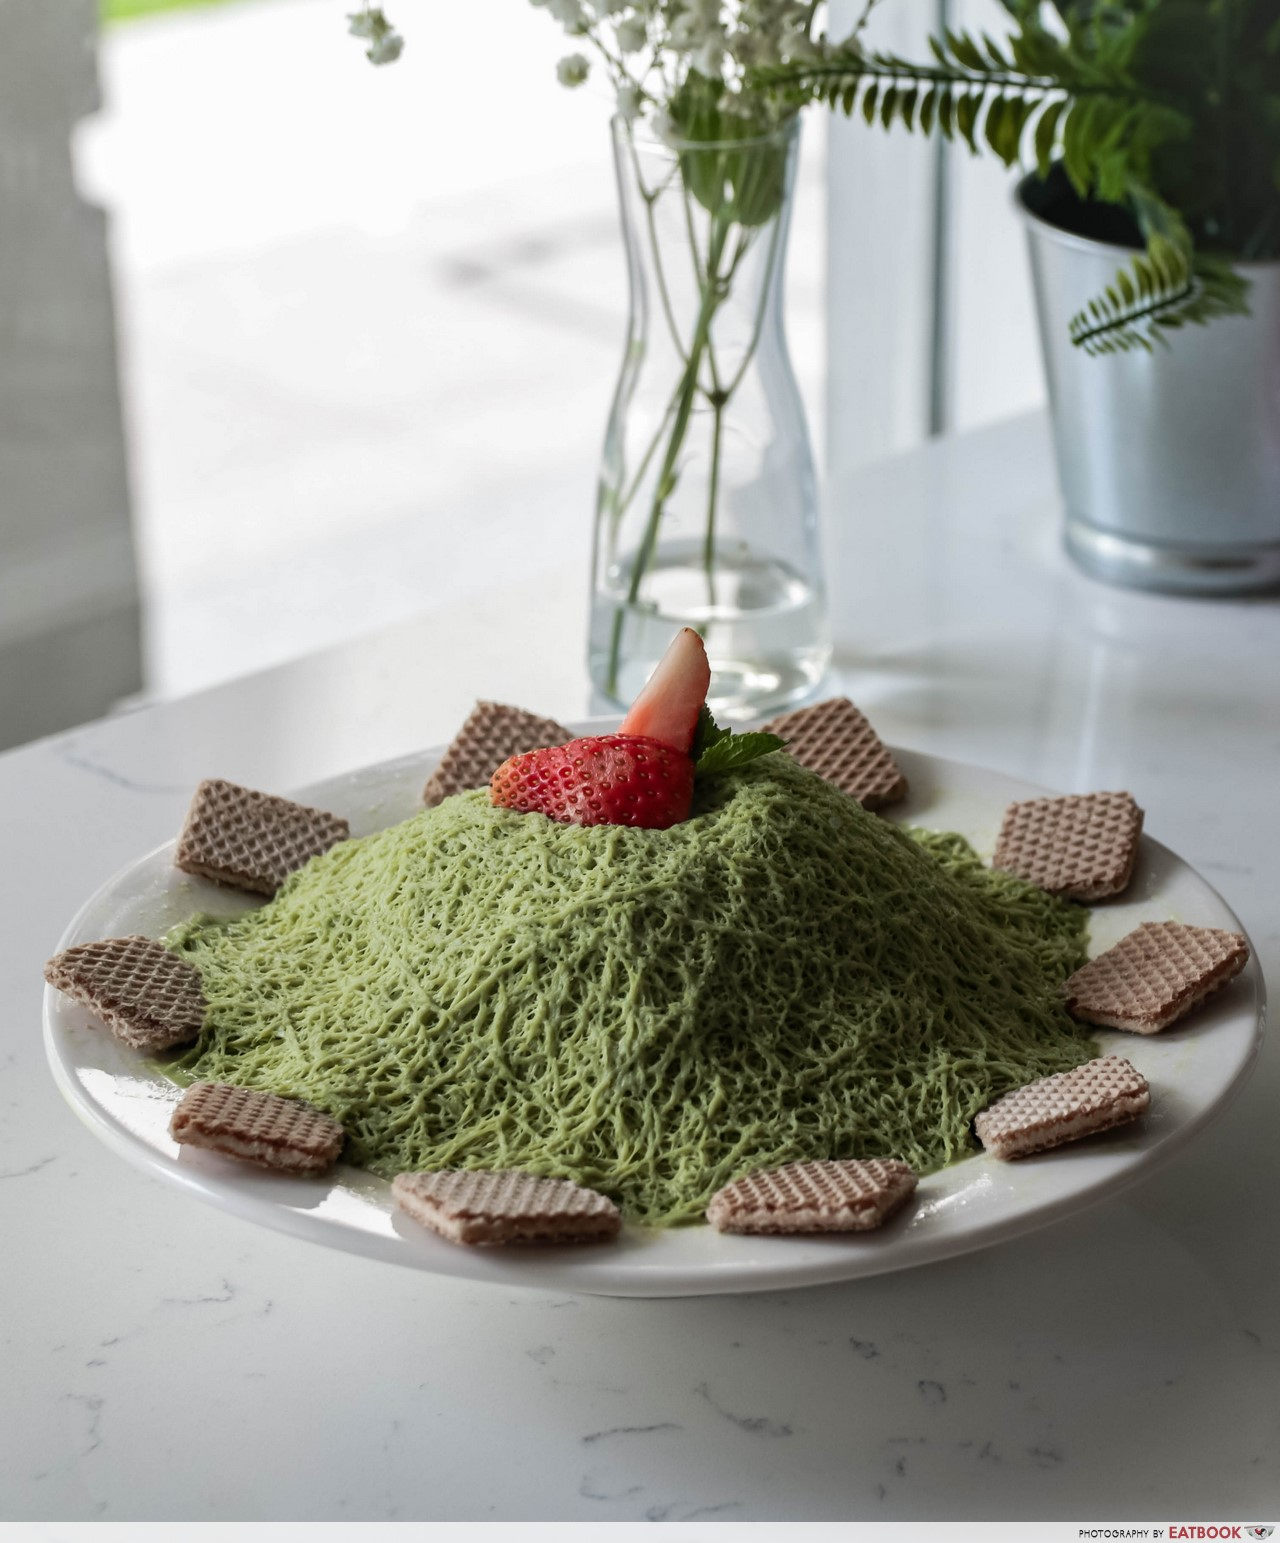 Romantic Cafes - Matcha Siltarae